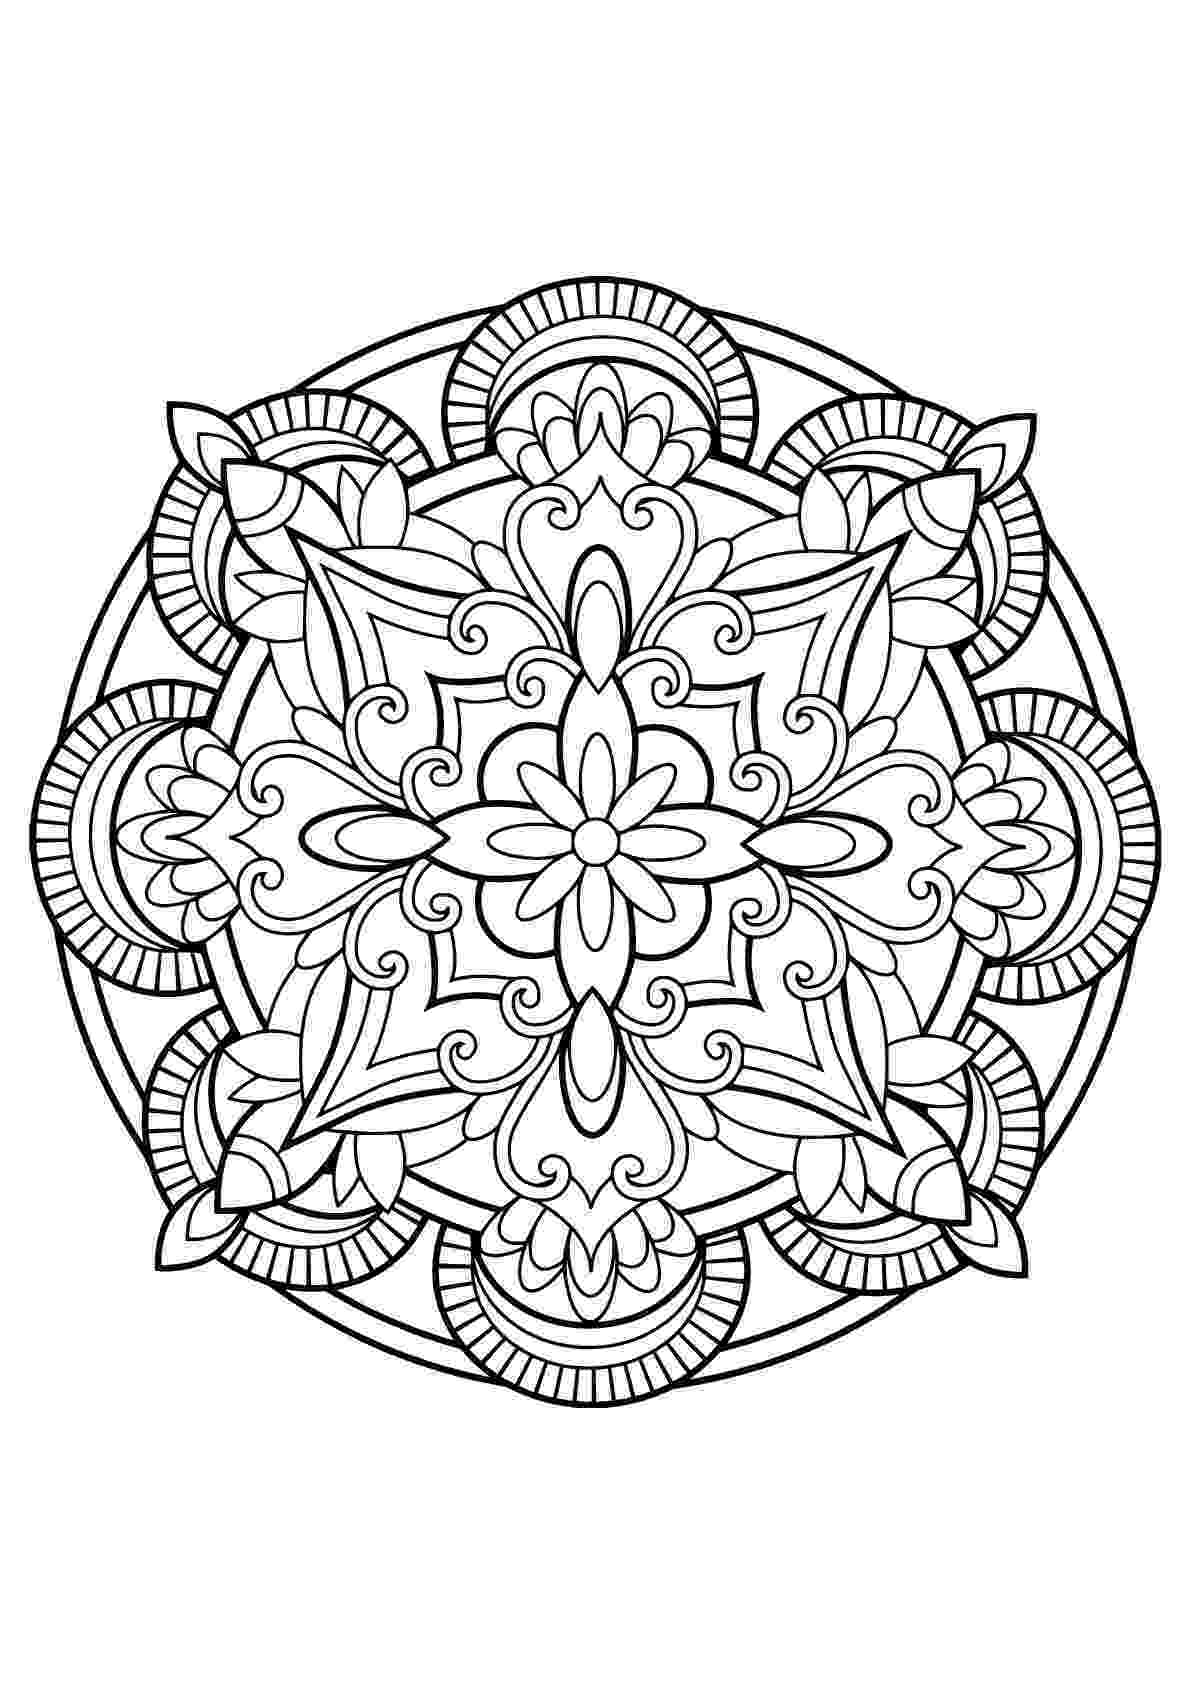 mandala coloring pages for adults free mandalas forming a original flower simple mandalas 100 coloring for adults free mandala pages